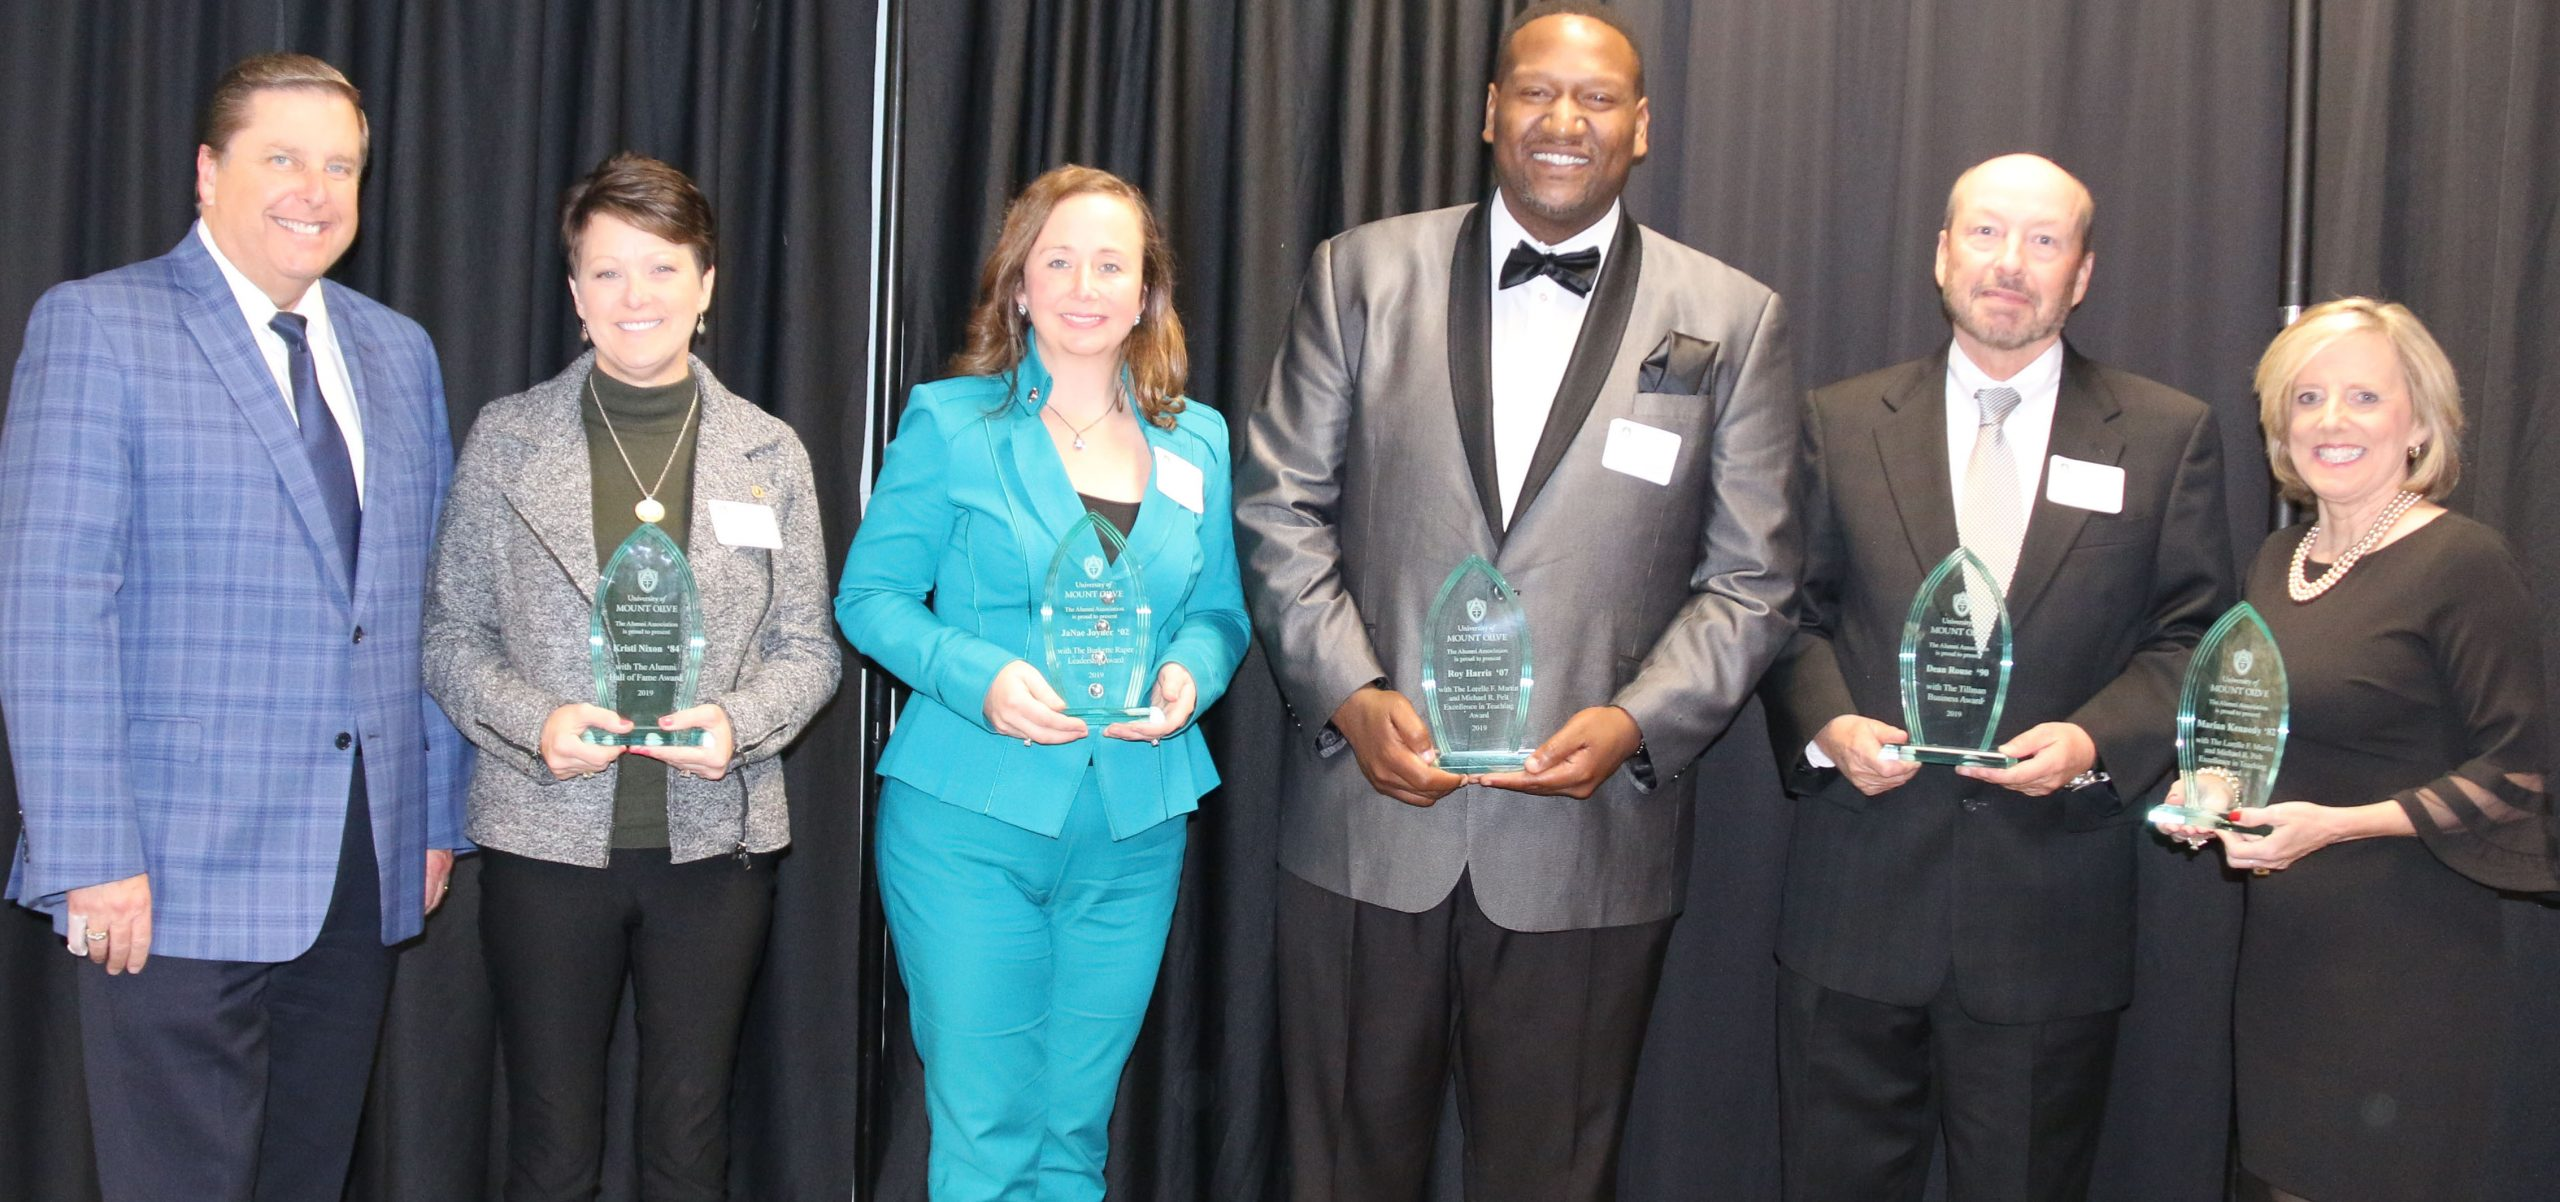 UMO Alumni Receive Awards